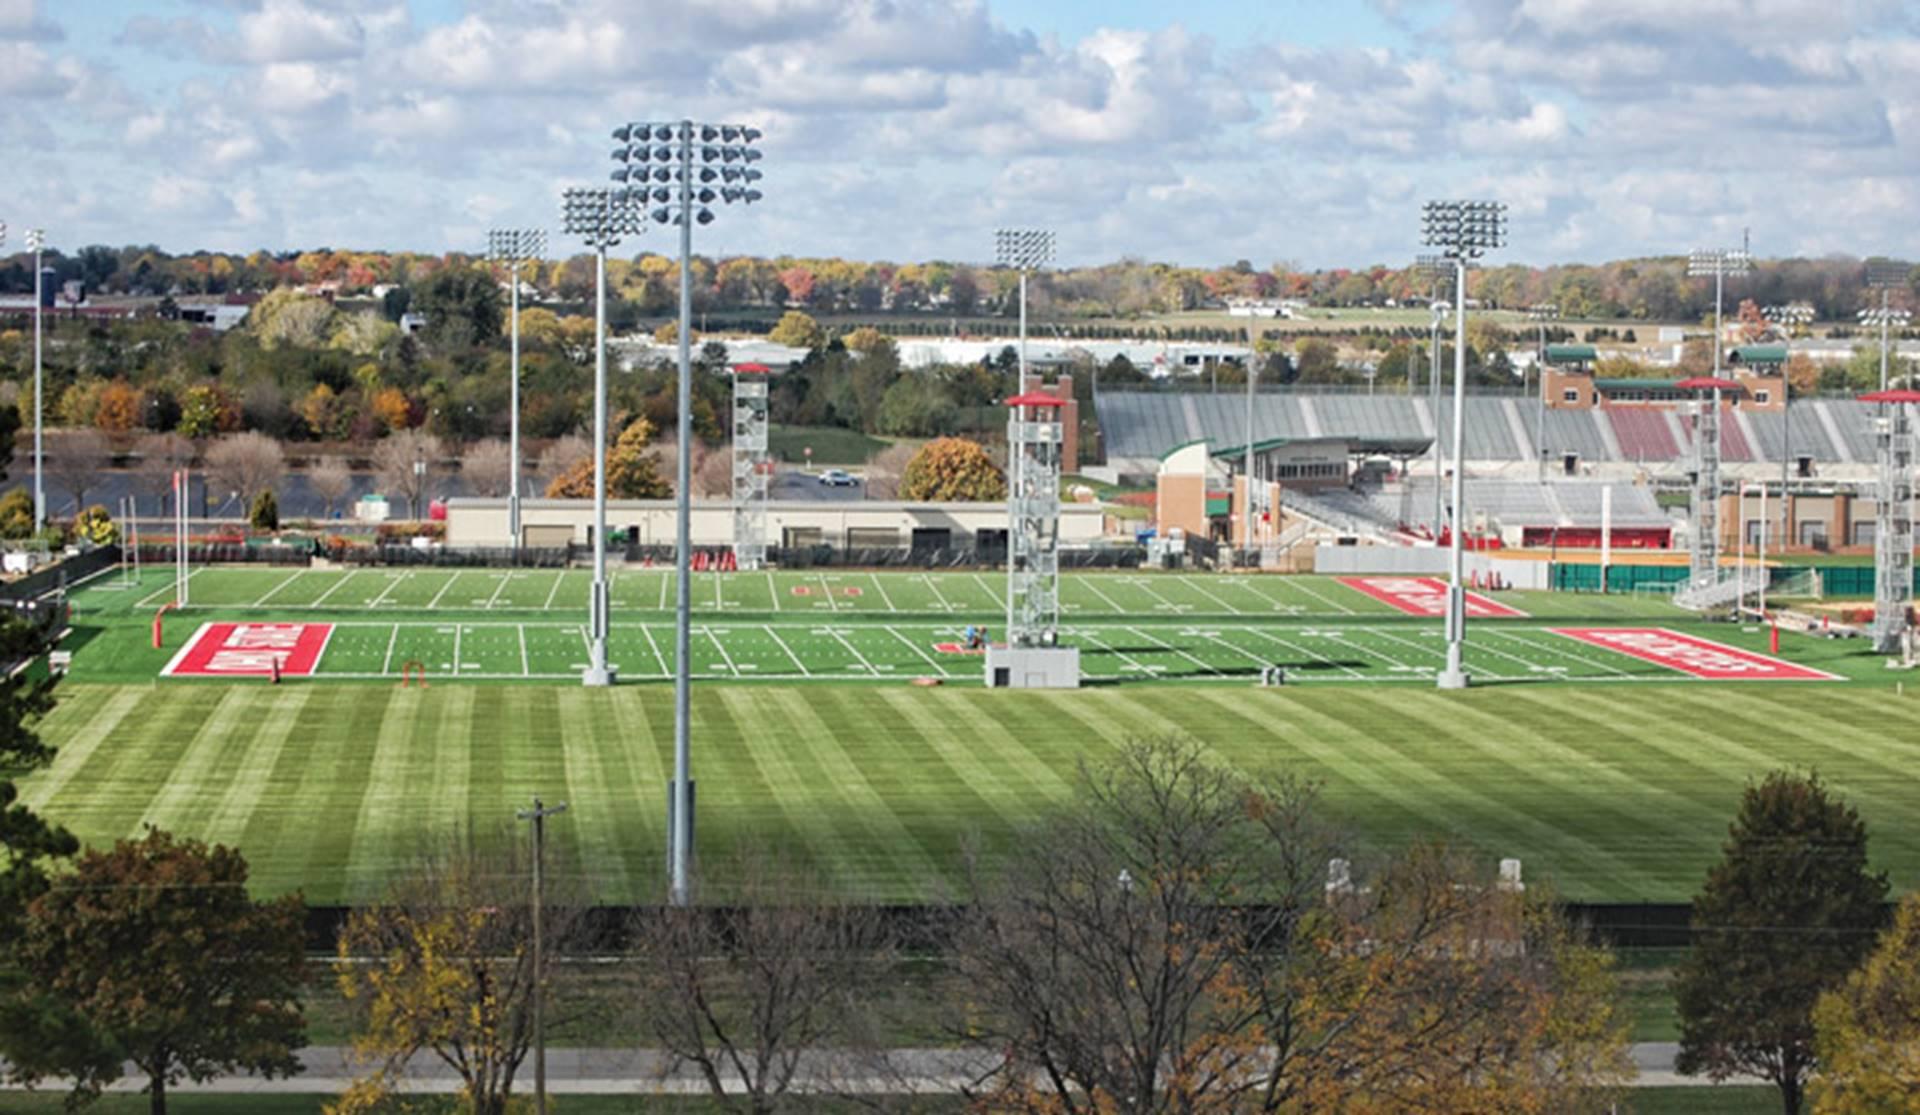 OSU Practice Fields Turf Install The Ohio State University